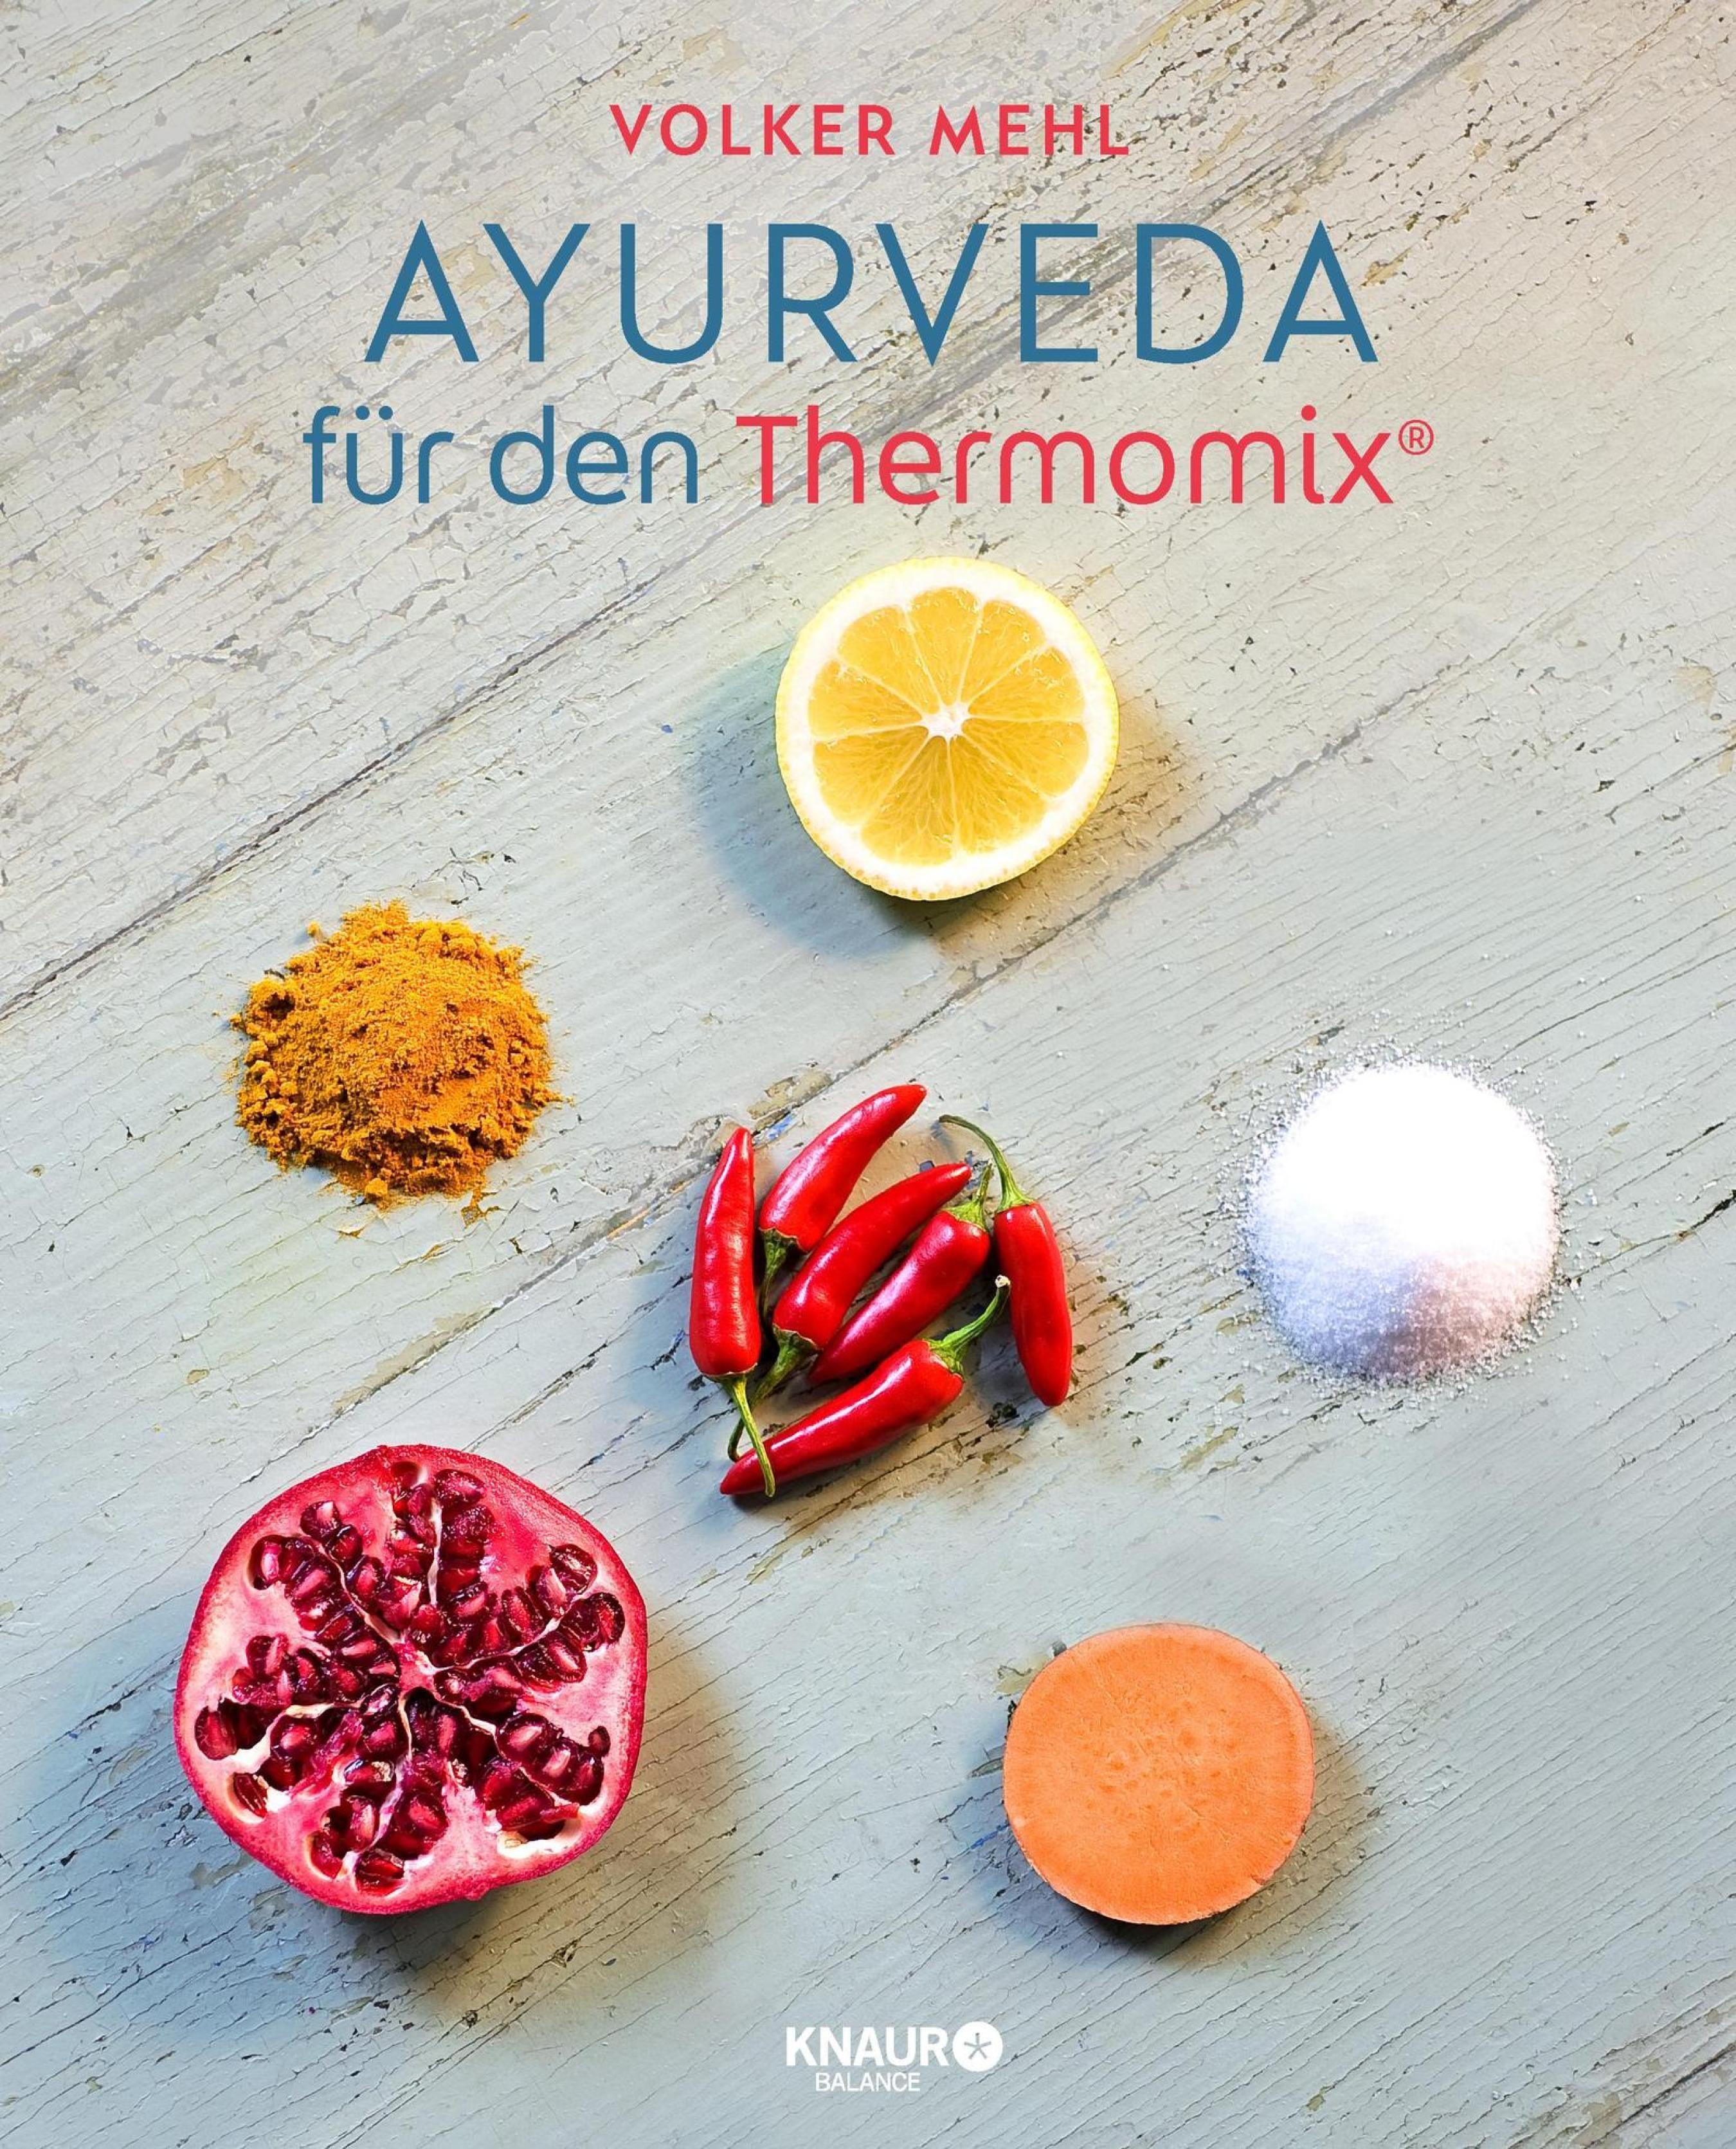 Ayurveda fr den thermomix ebook volker mehl descargar libro pdf ayurveda fr den thermomix ebook volker mehl 9783426440957 forumfinder Images